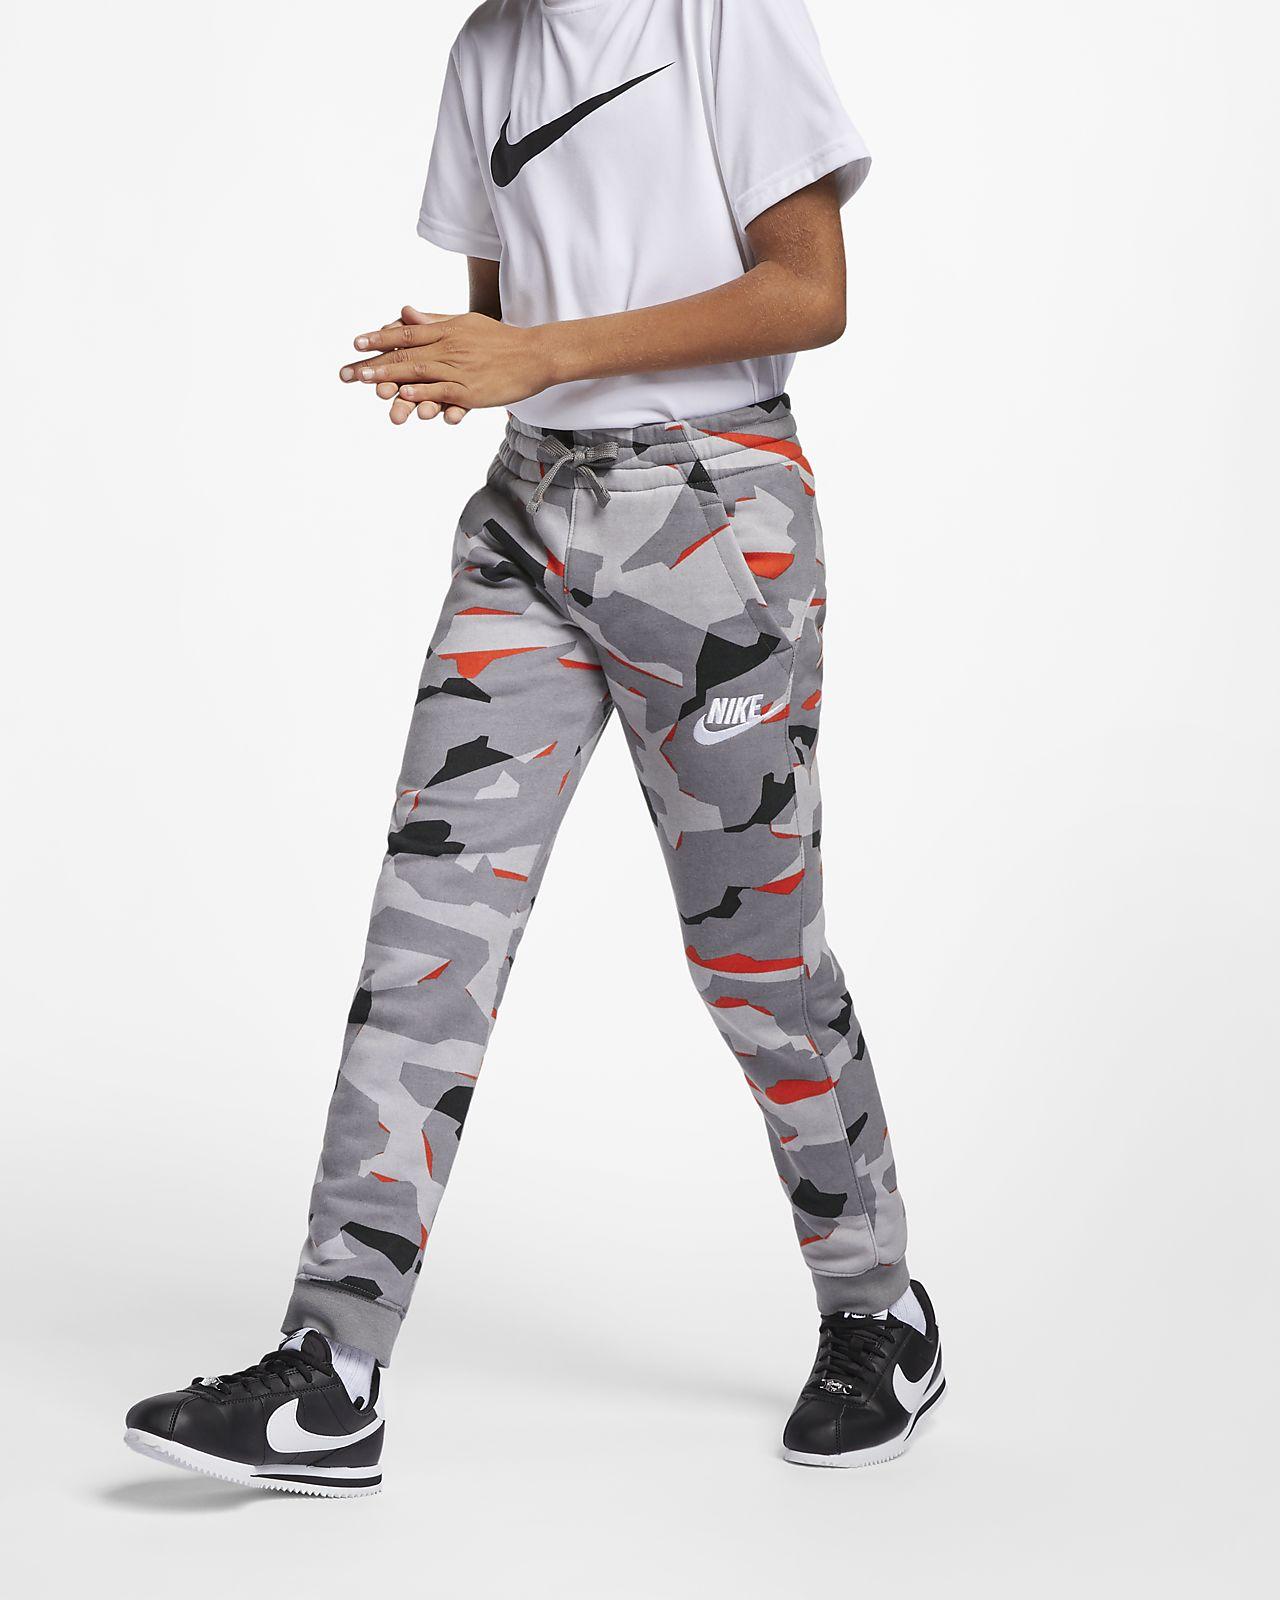 Nike Sportswear Camo-Jogger für ältere Kinder (Jungen)